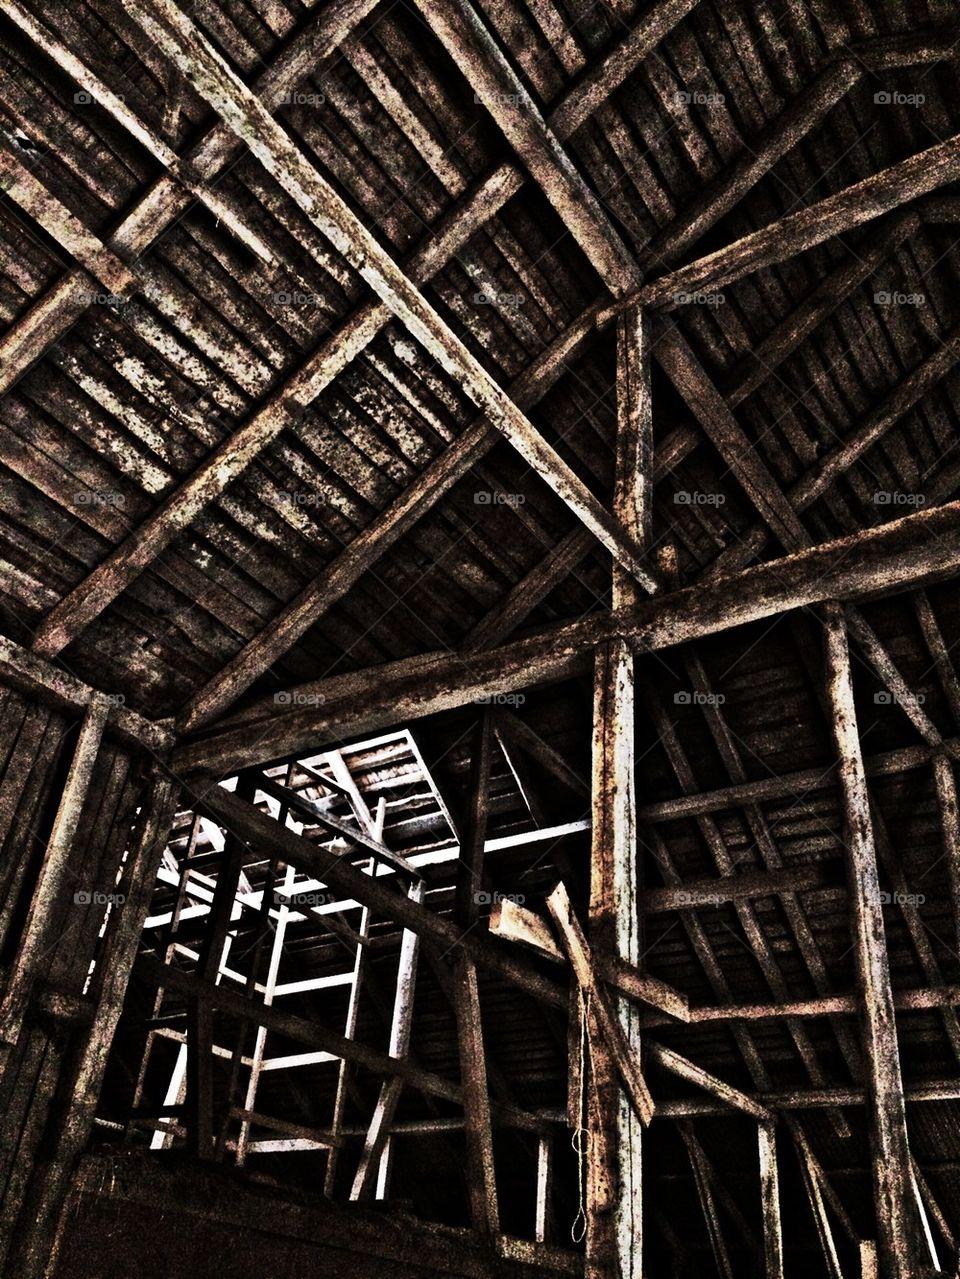 To the attic